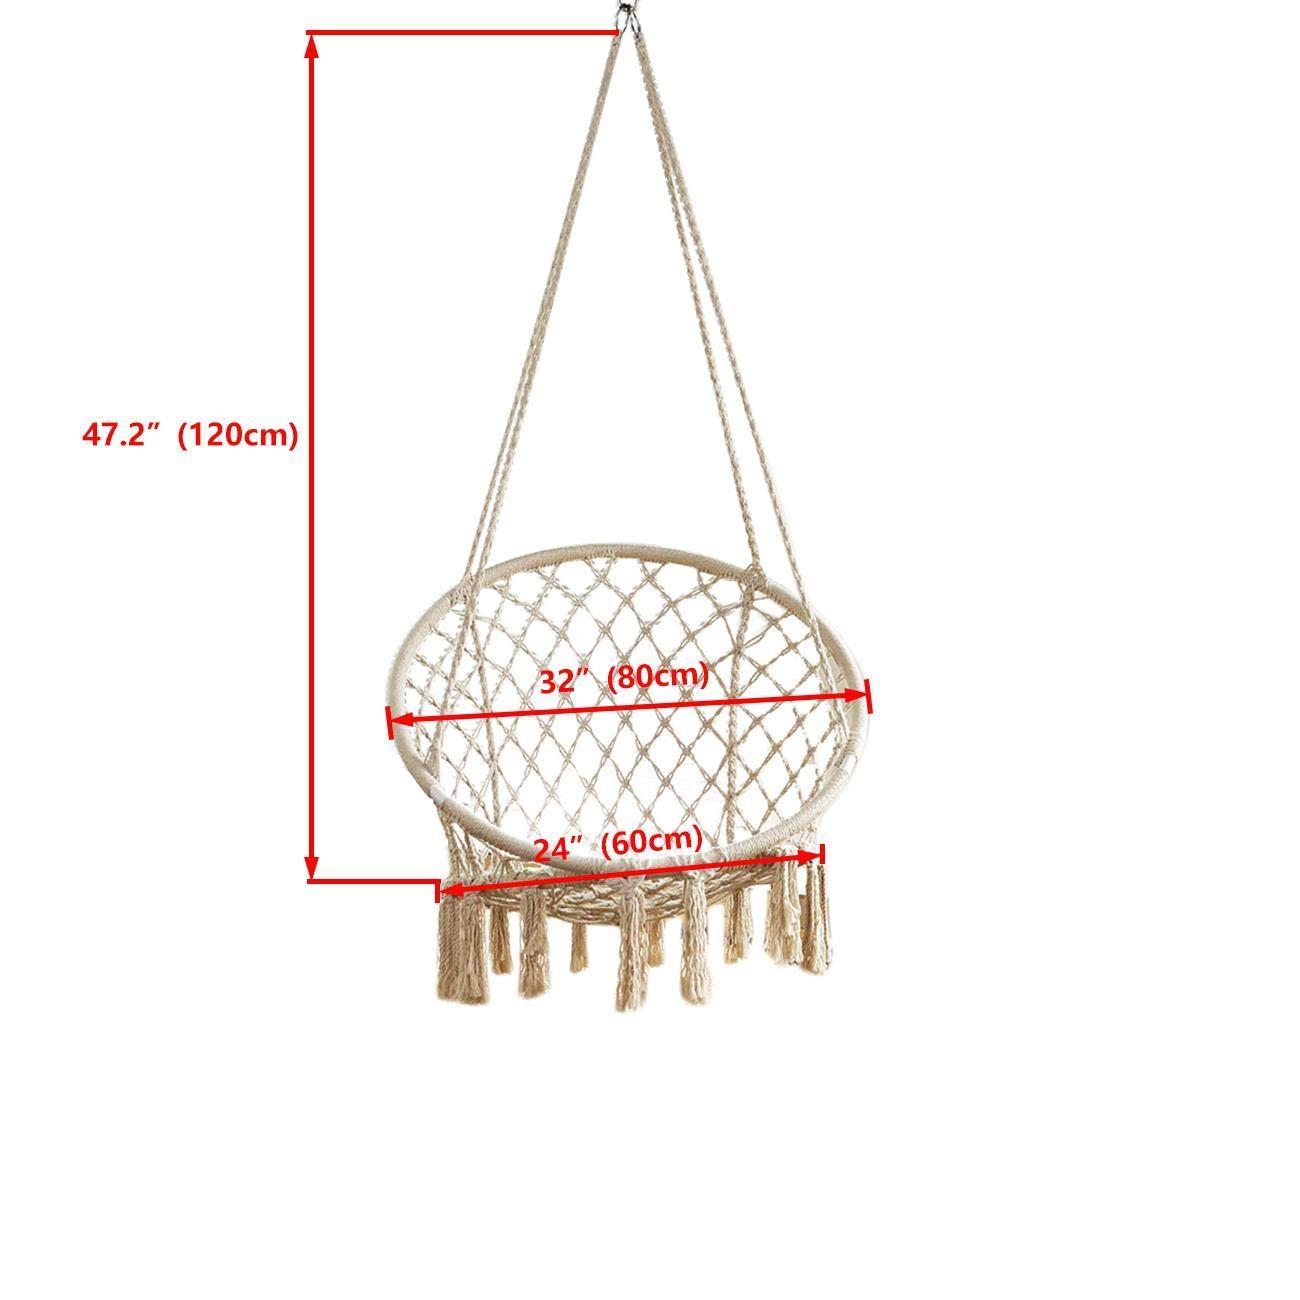 BEAMNOVA 265 lbs Capacity Hammock Chair with Hanging Hardware for Indoor Outdoor Beige by BEAMNOVA (Image #5)